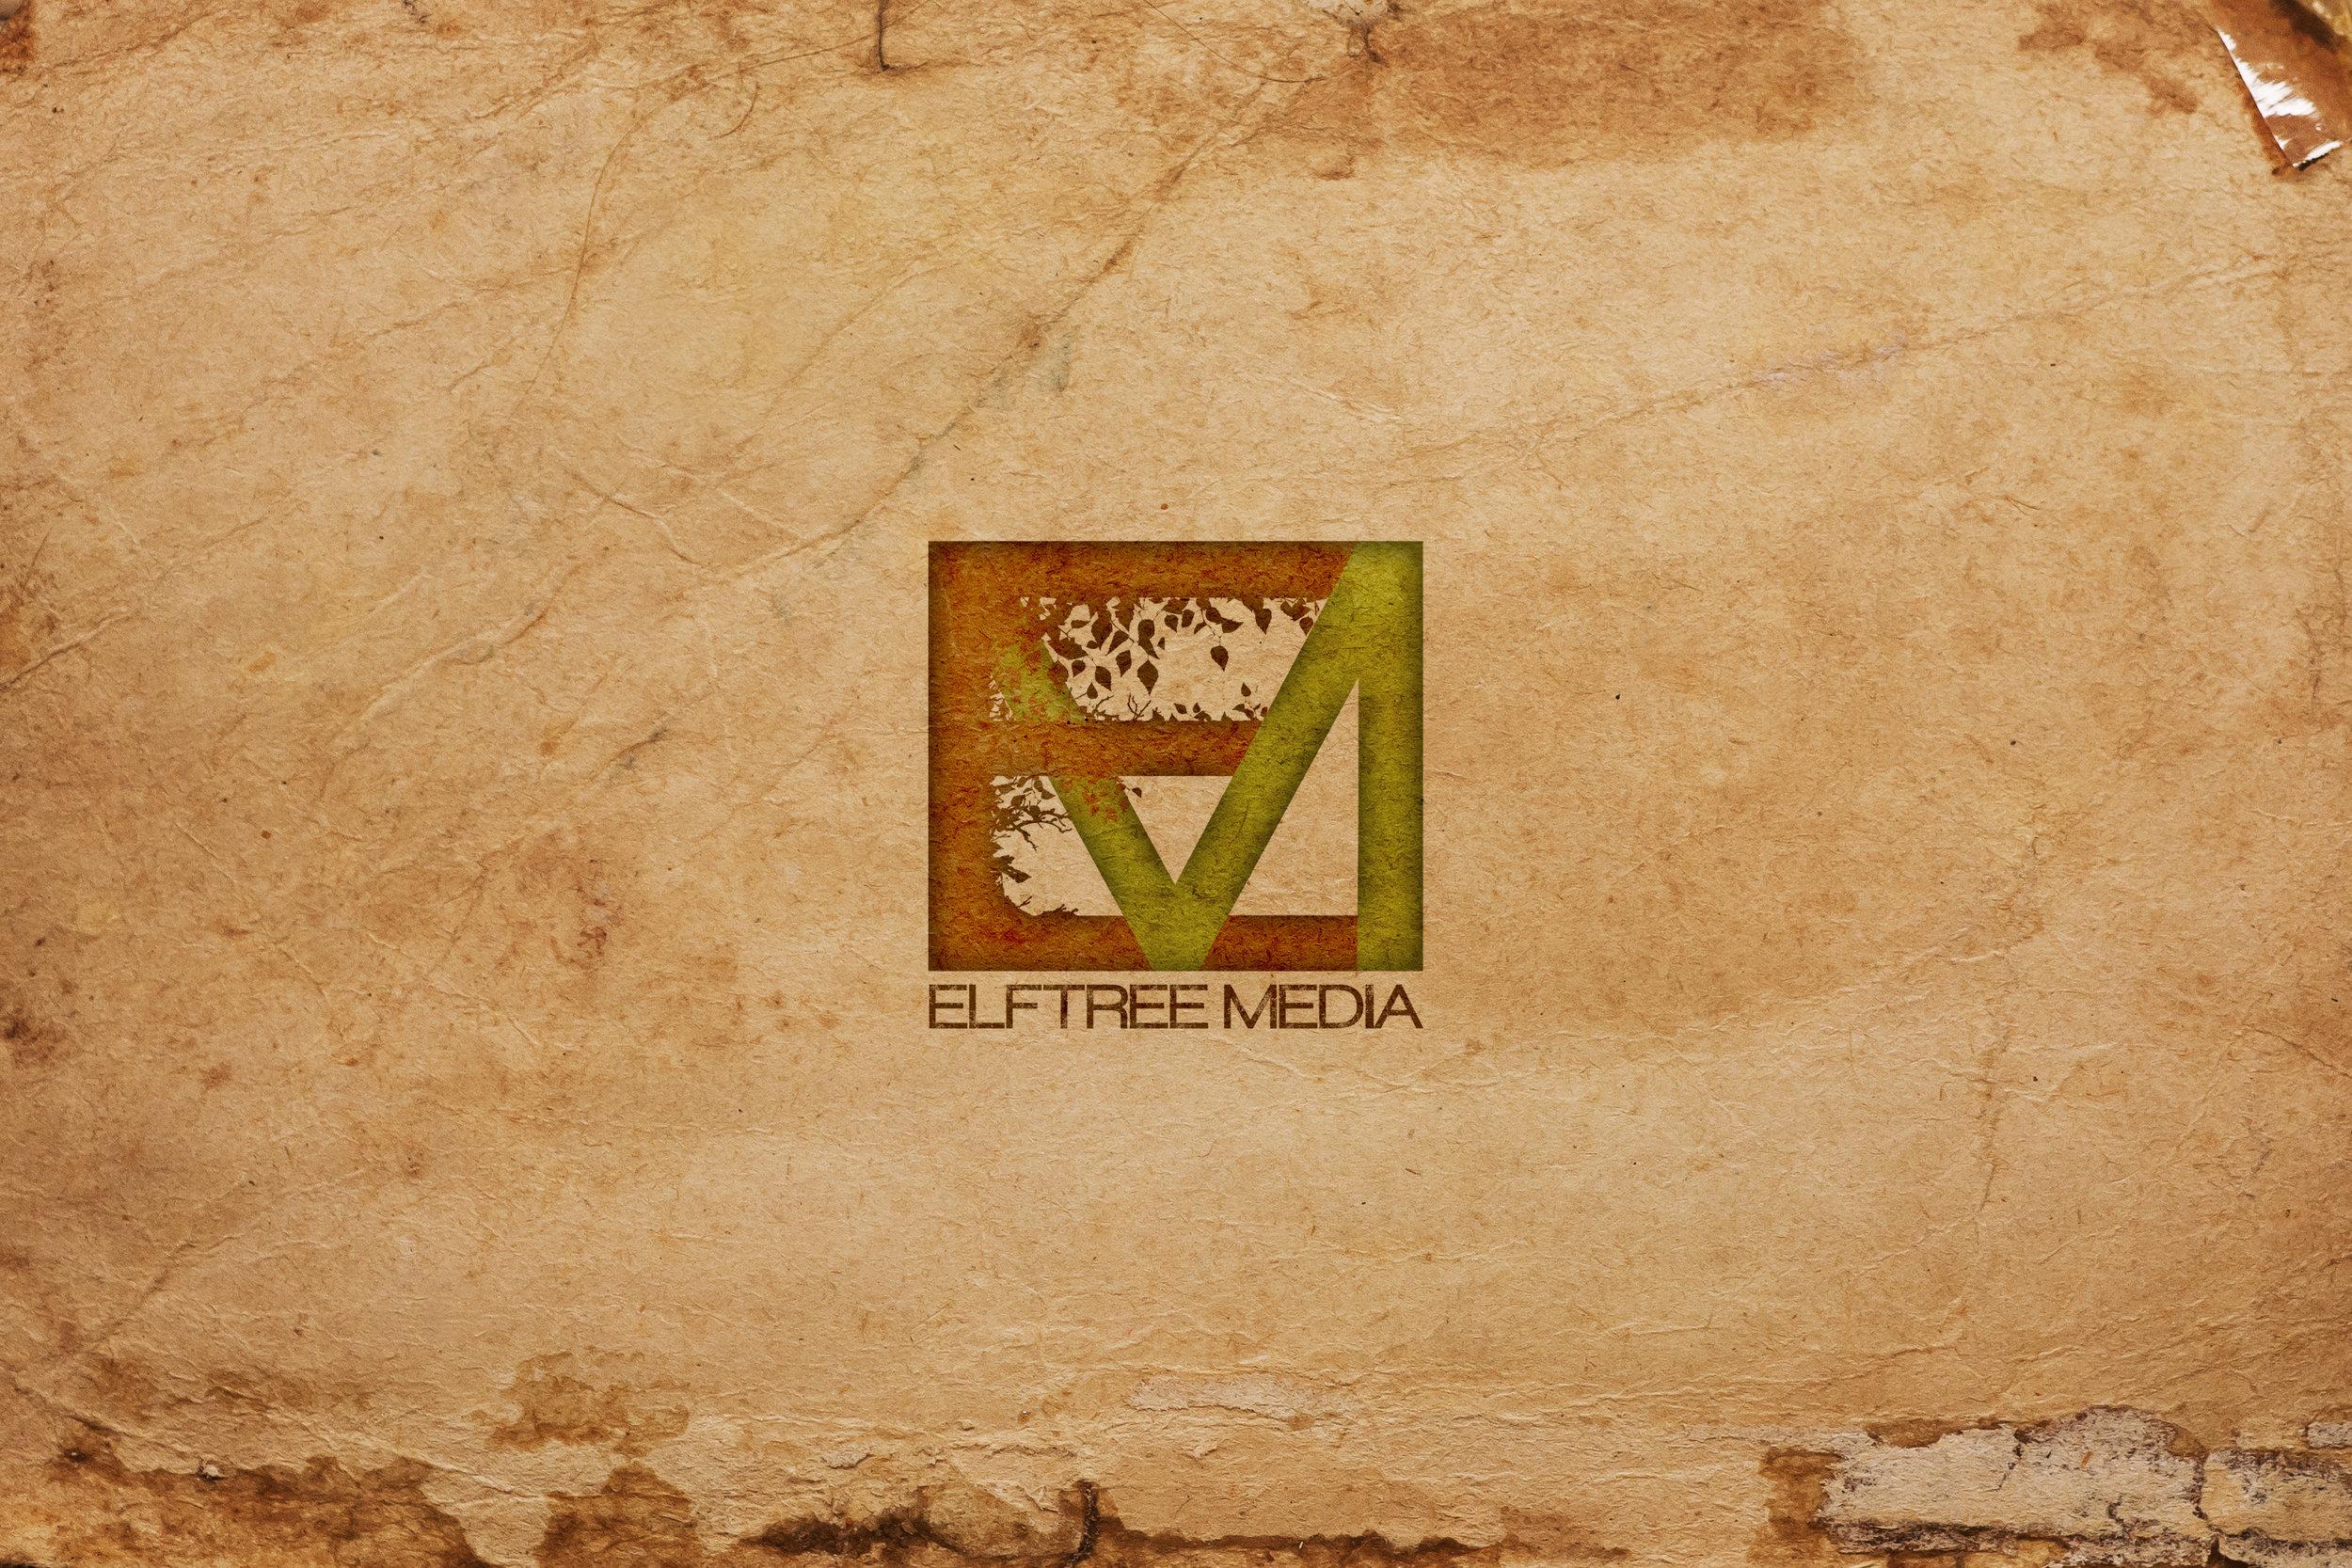 ElfTreeMedia_Old_Paper_Background.jpg